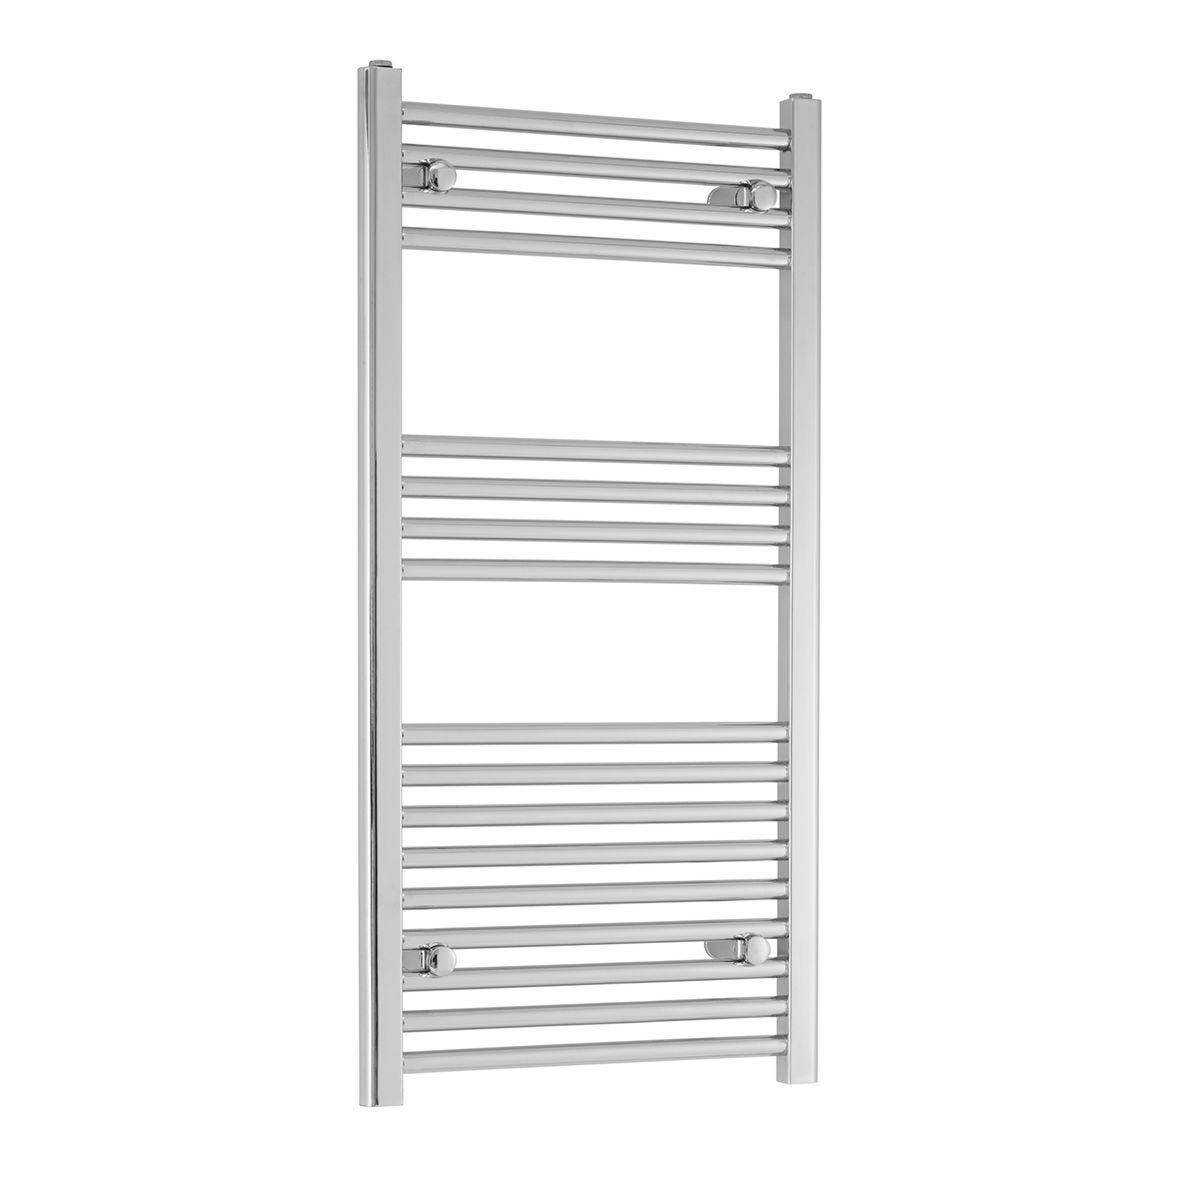 Heating Style Blythe Ladder Rail 1200x500mm Straight - Chrome